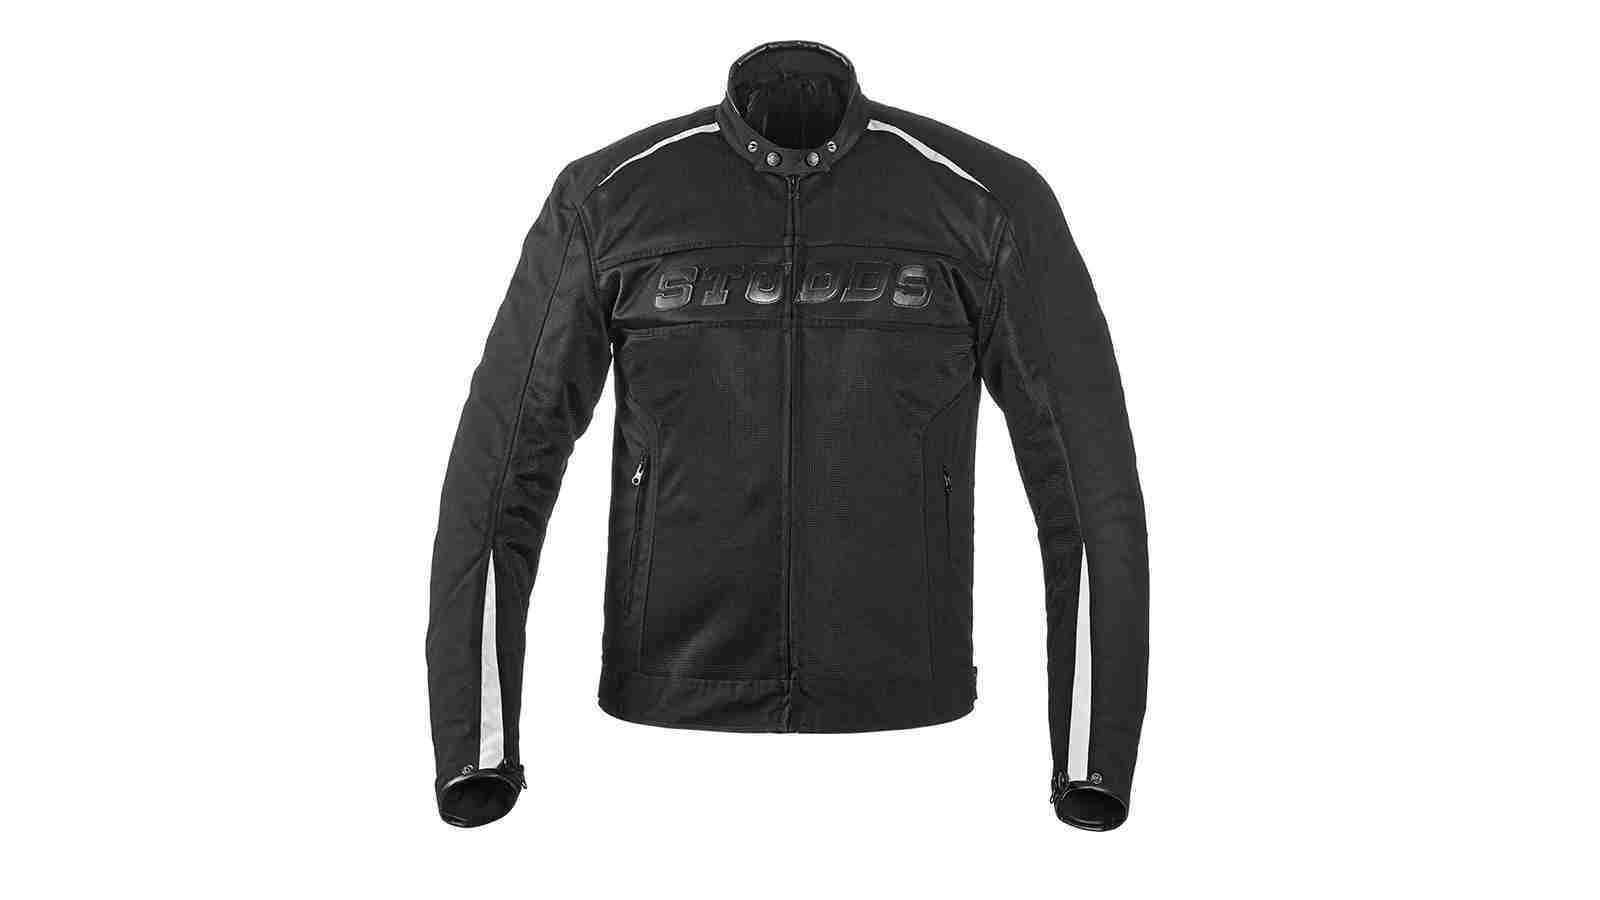 STUDDS Riding Jacket - Black